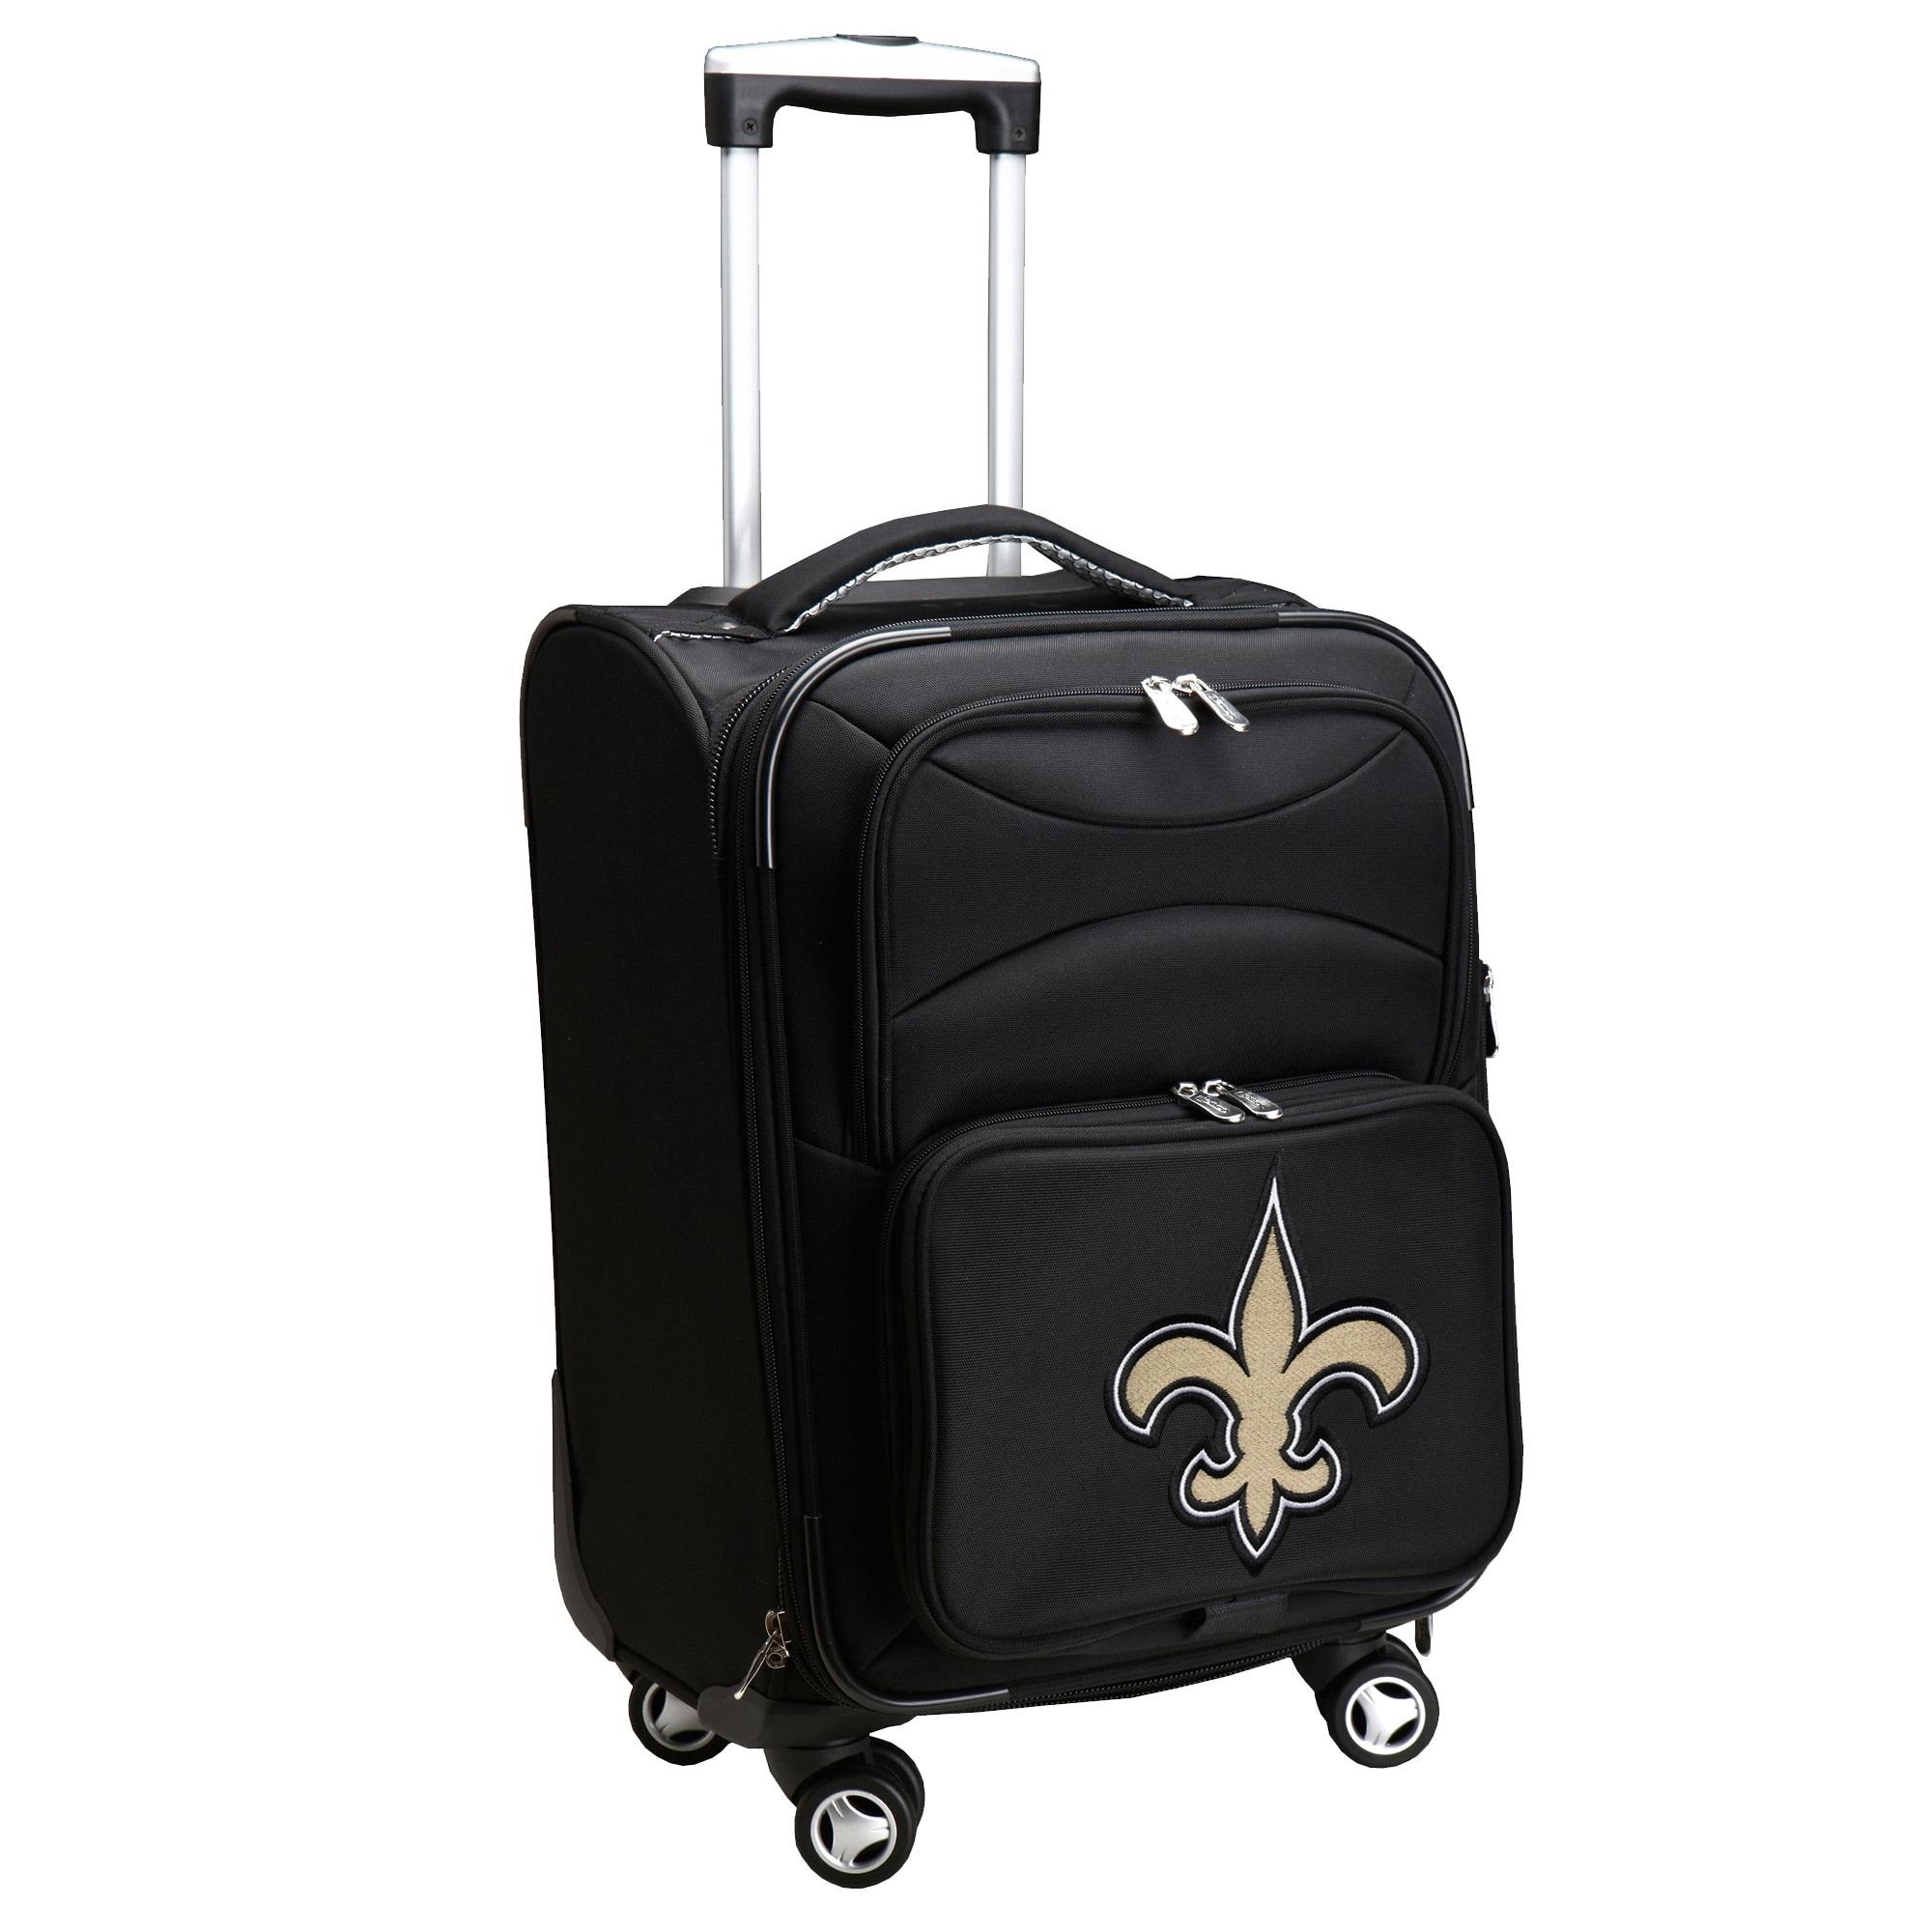 "New Orleans Saints 21"" Spinner Carry-On - Black"